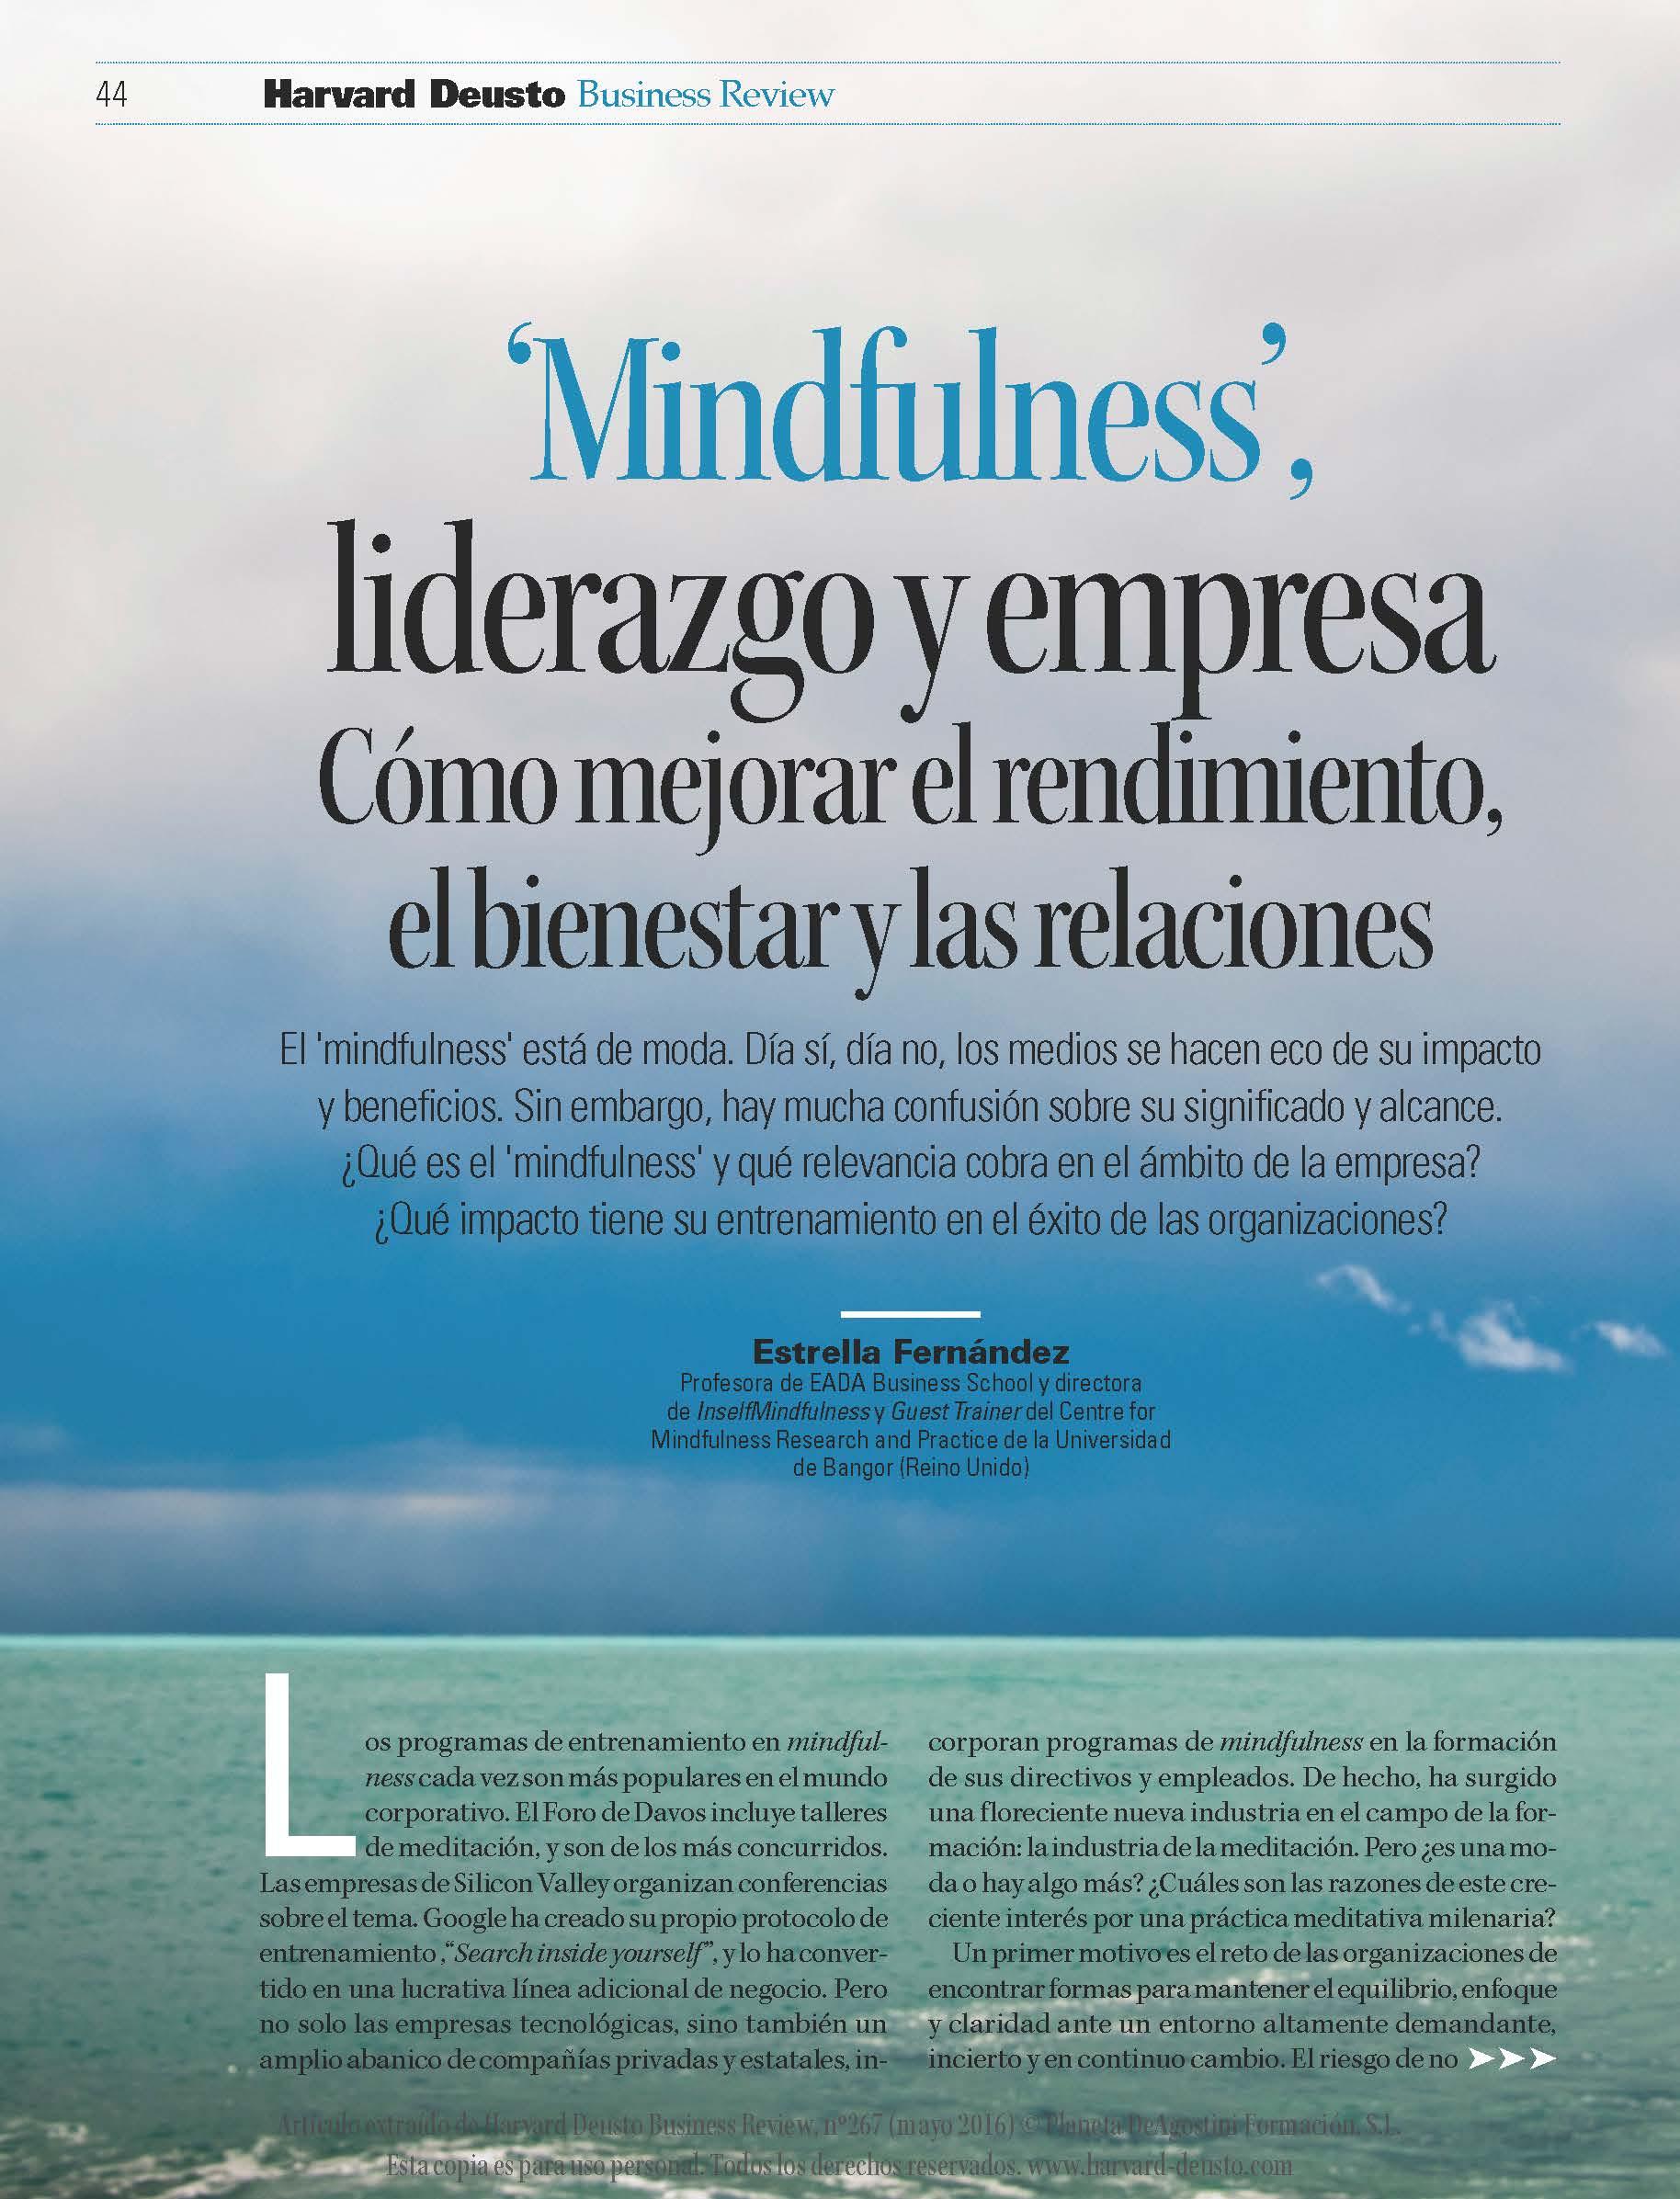 mindfulness y empresas. HBR. Estrella (2017)_Página_1.jpg